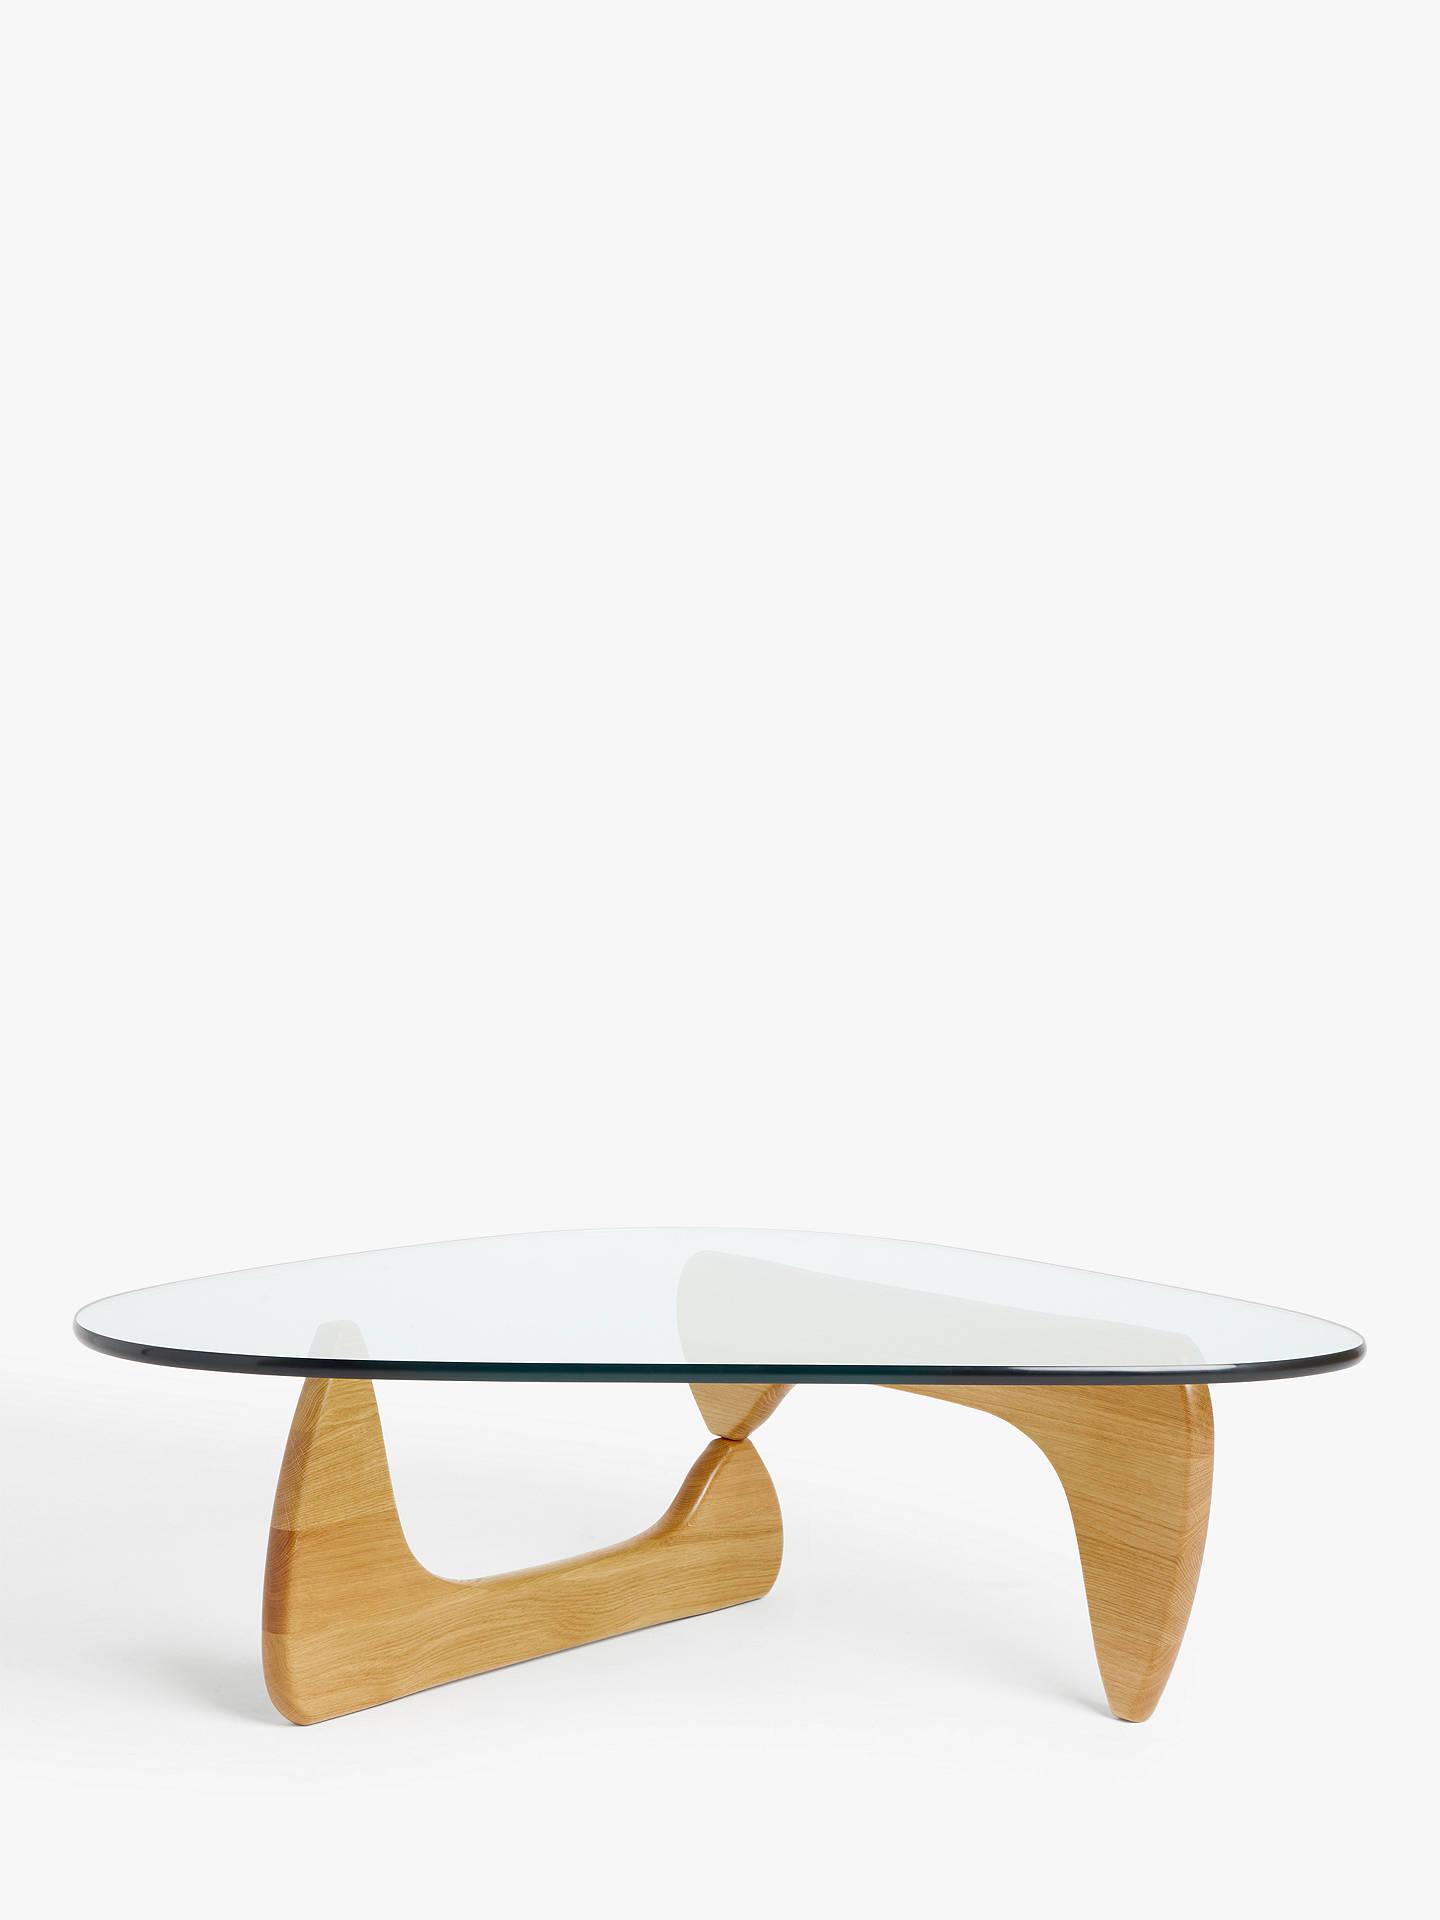 Vitra Noguchi Coffee Table Solid Oak